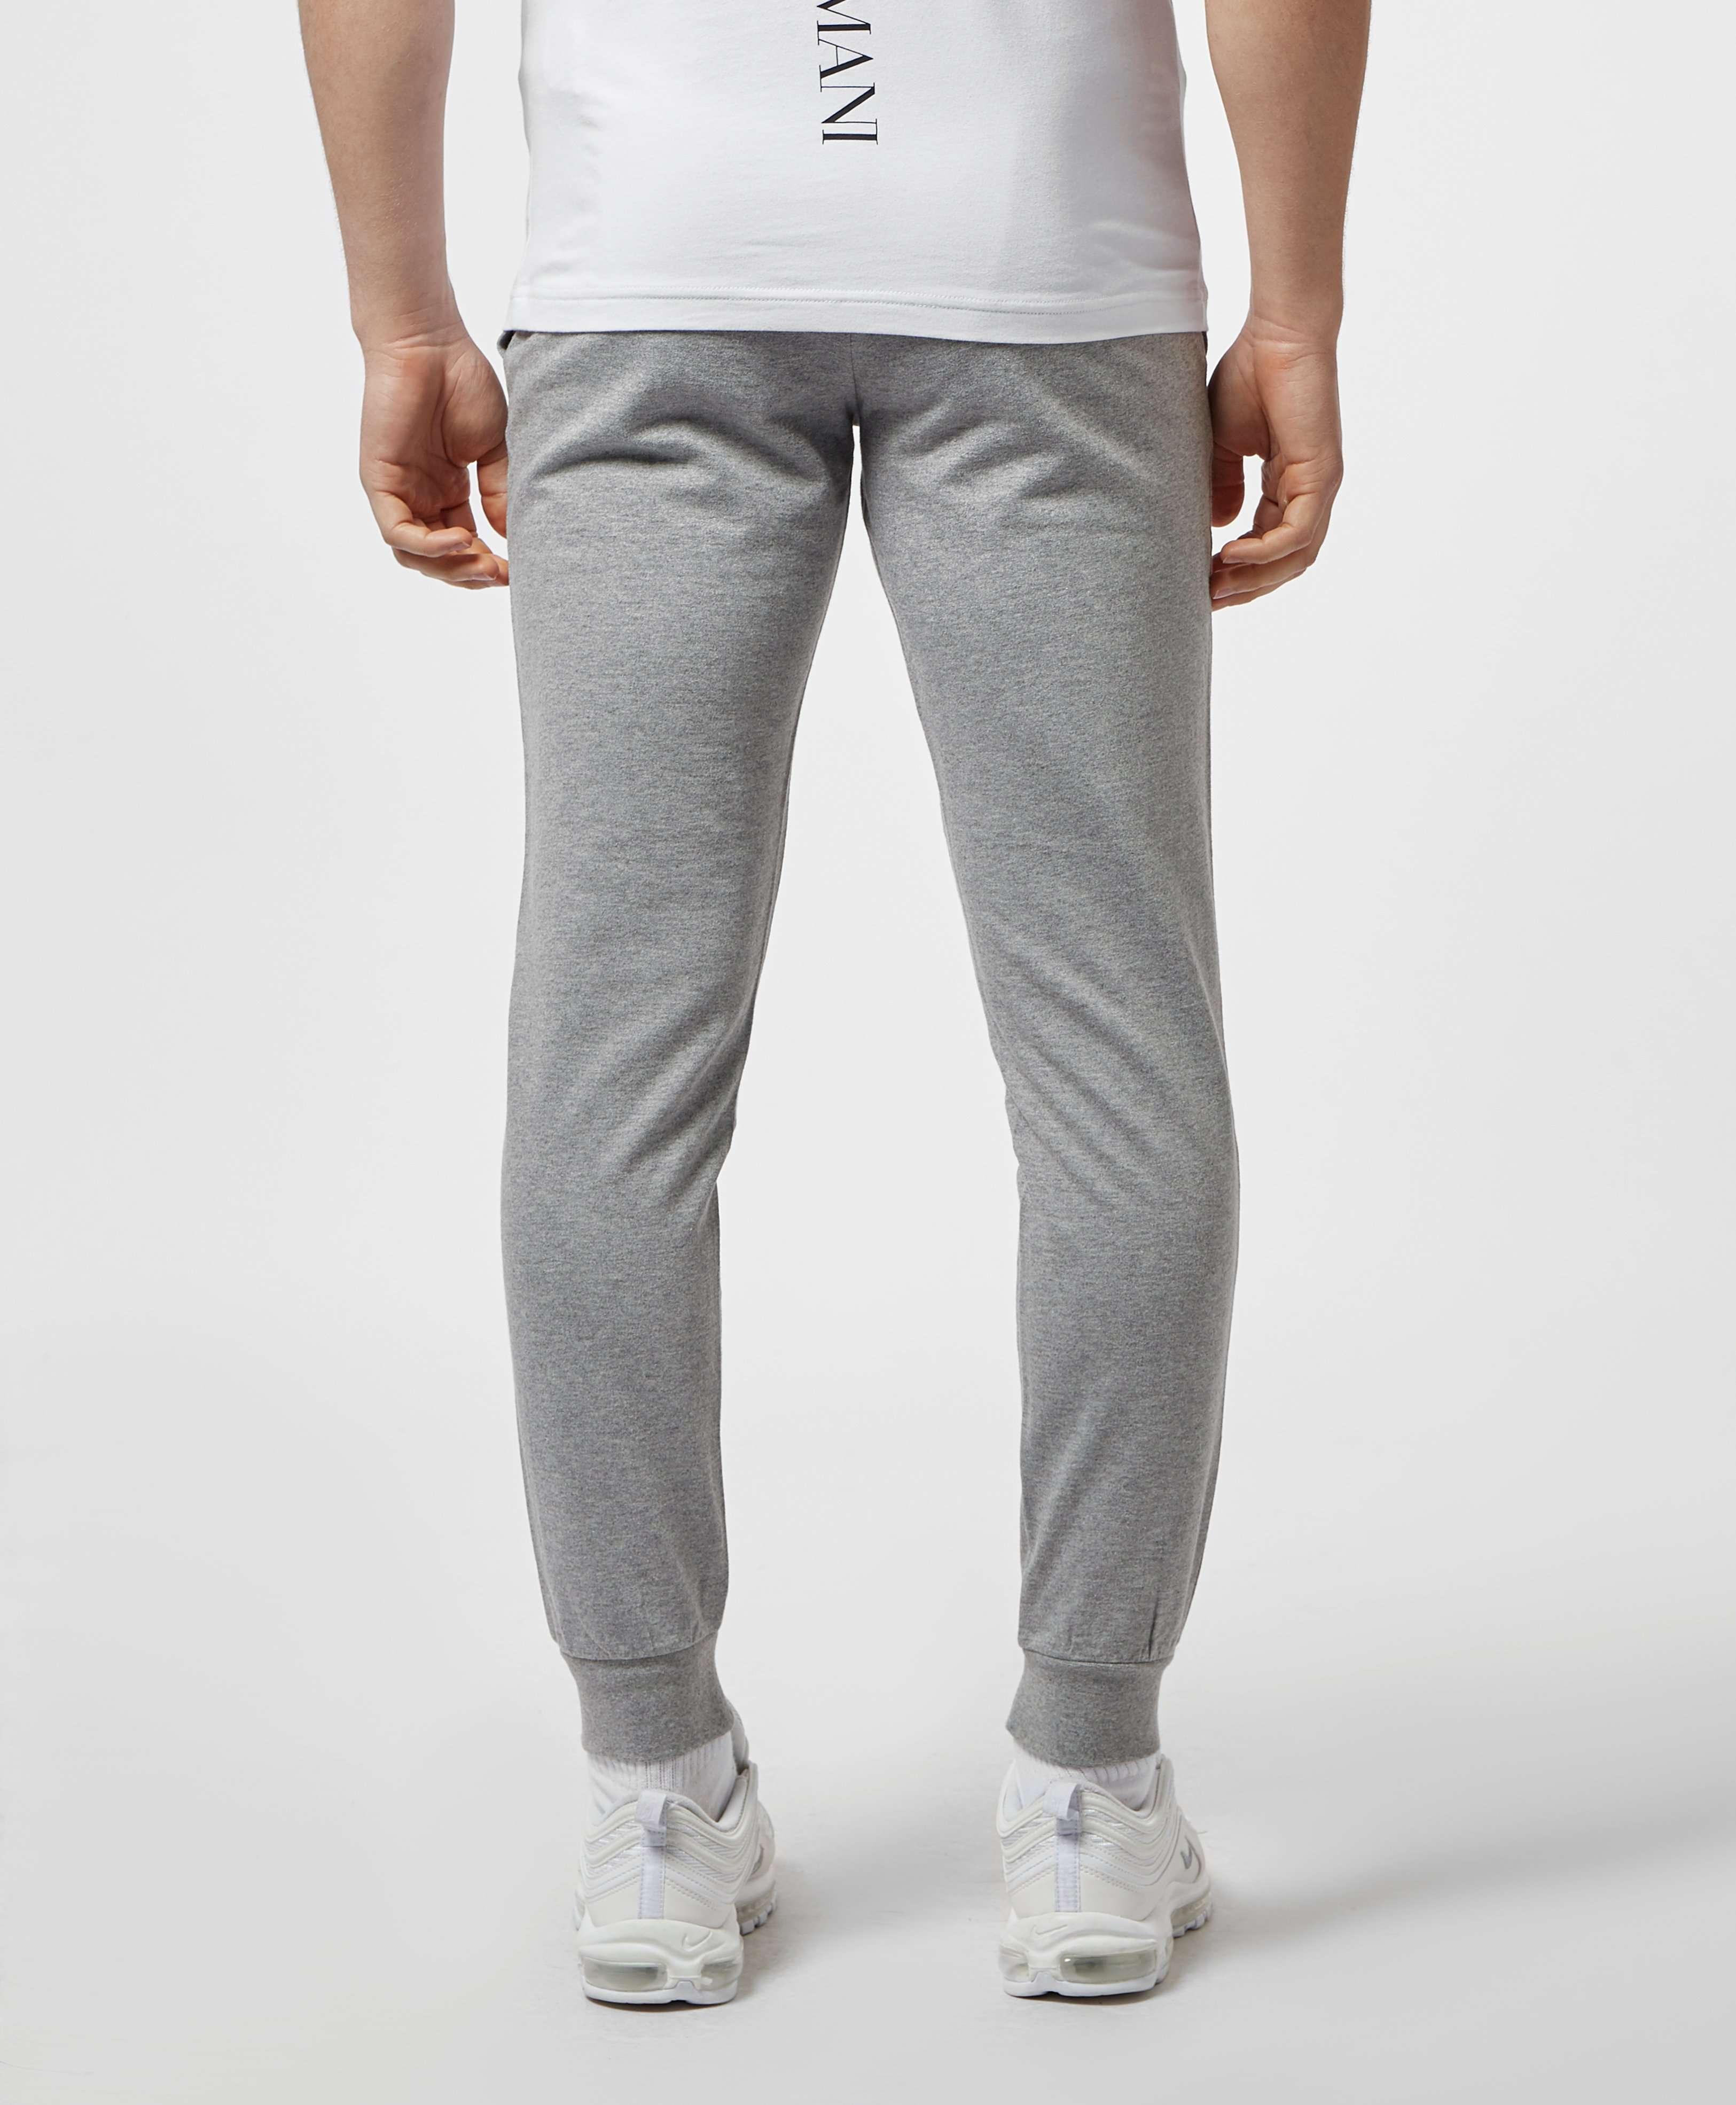 Emporio Armani EA7 Core Slim Cuffed Fleece Pants